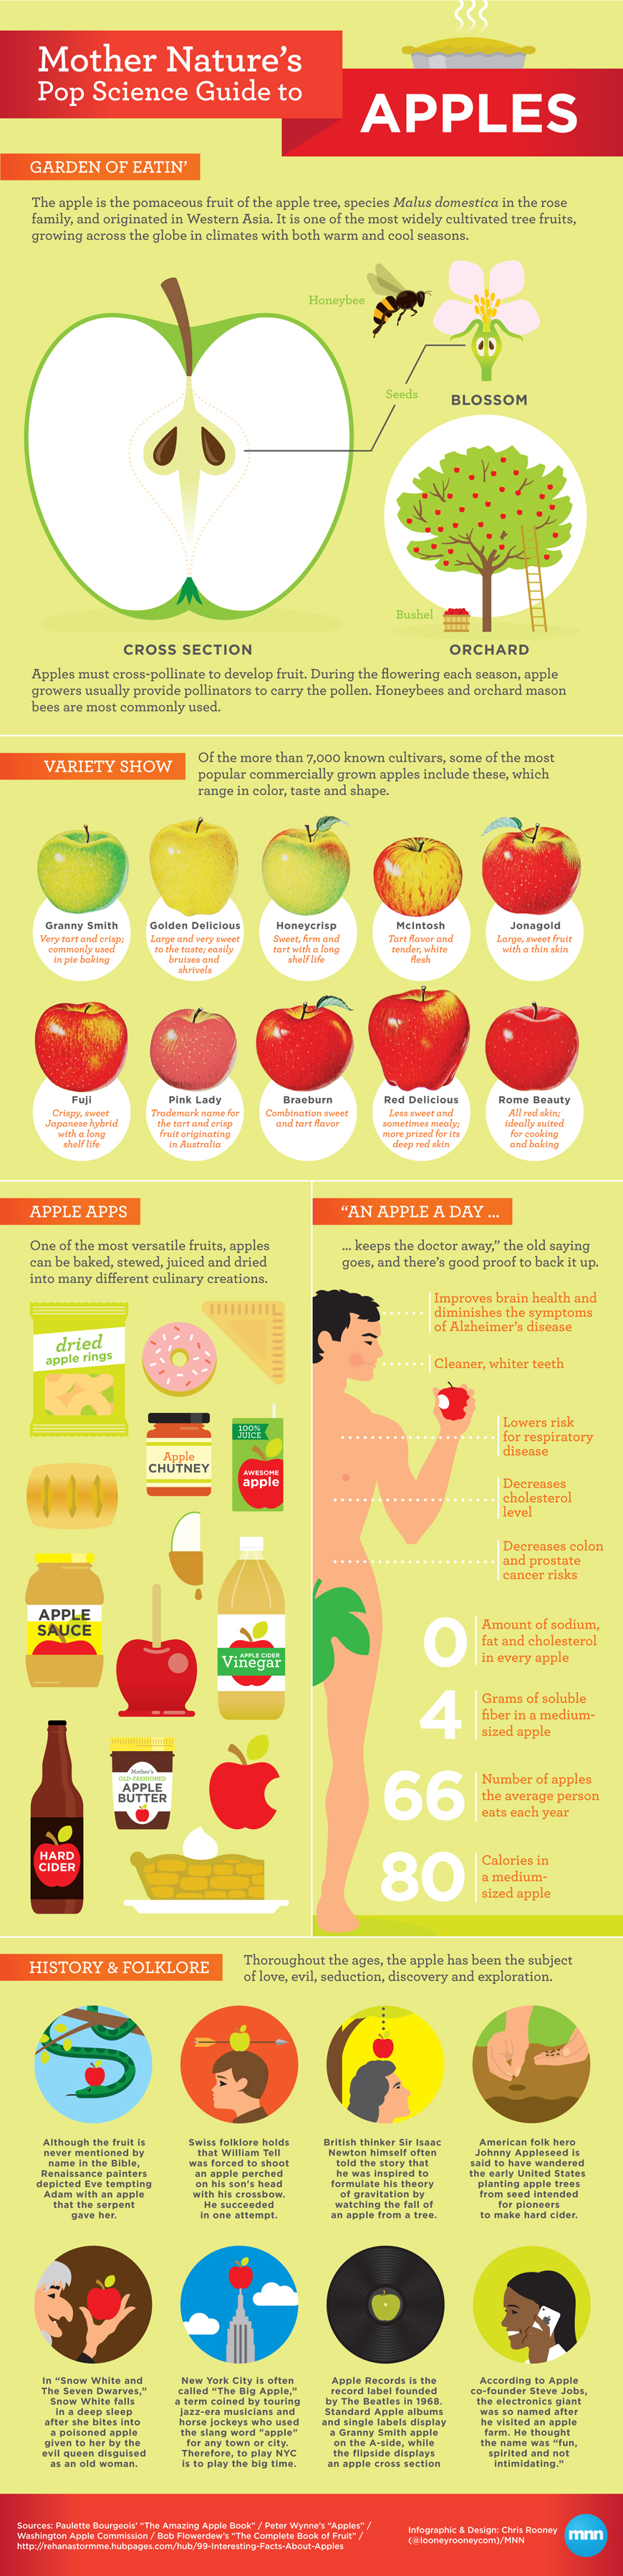 apples_infographic.jpg